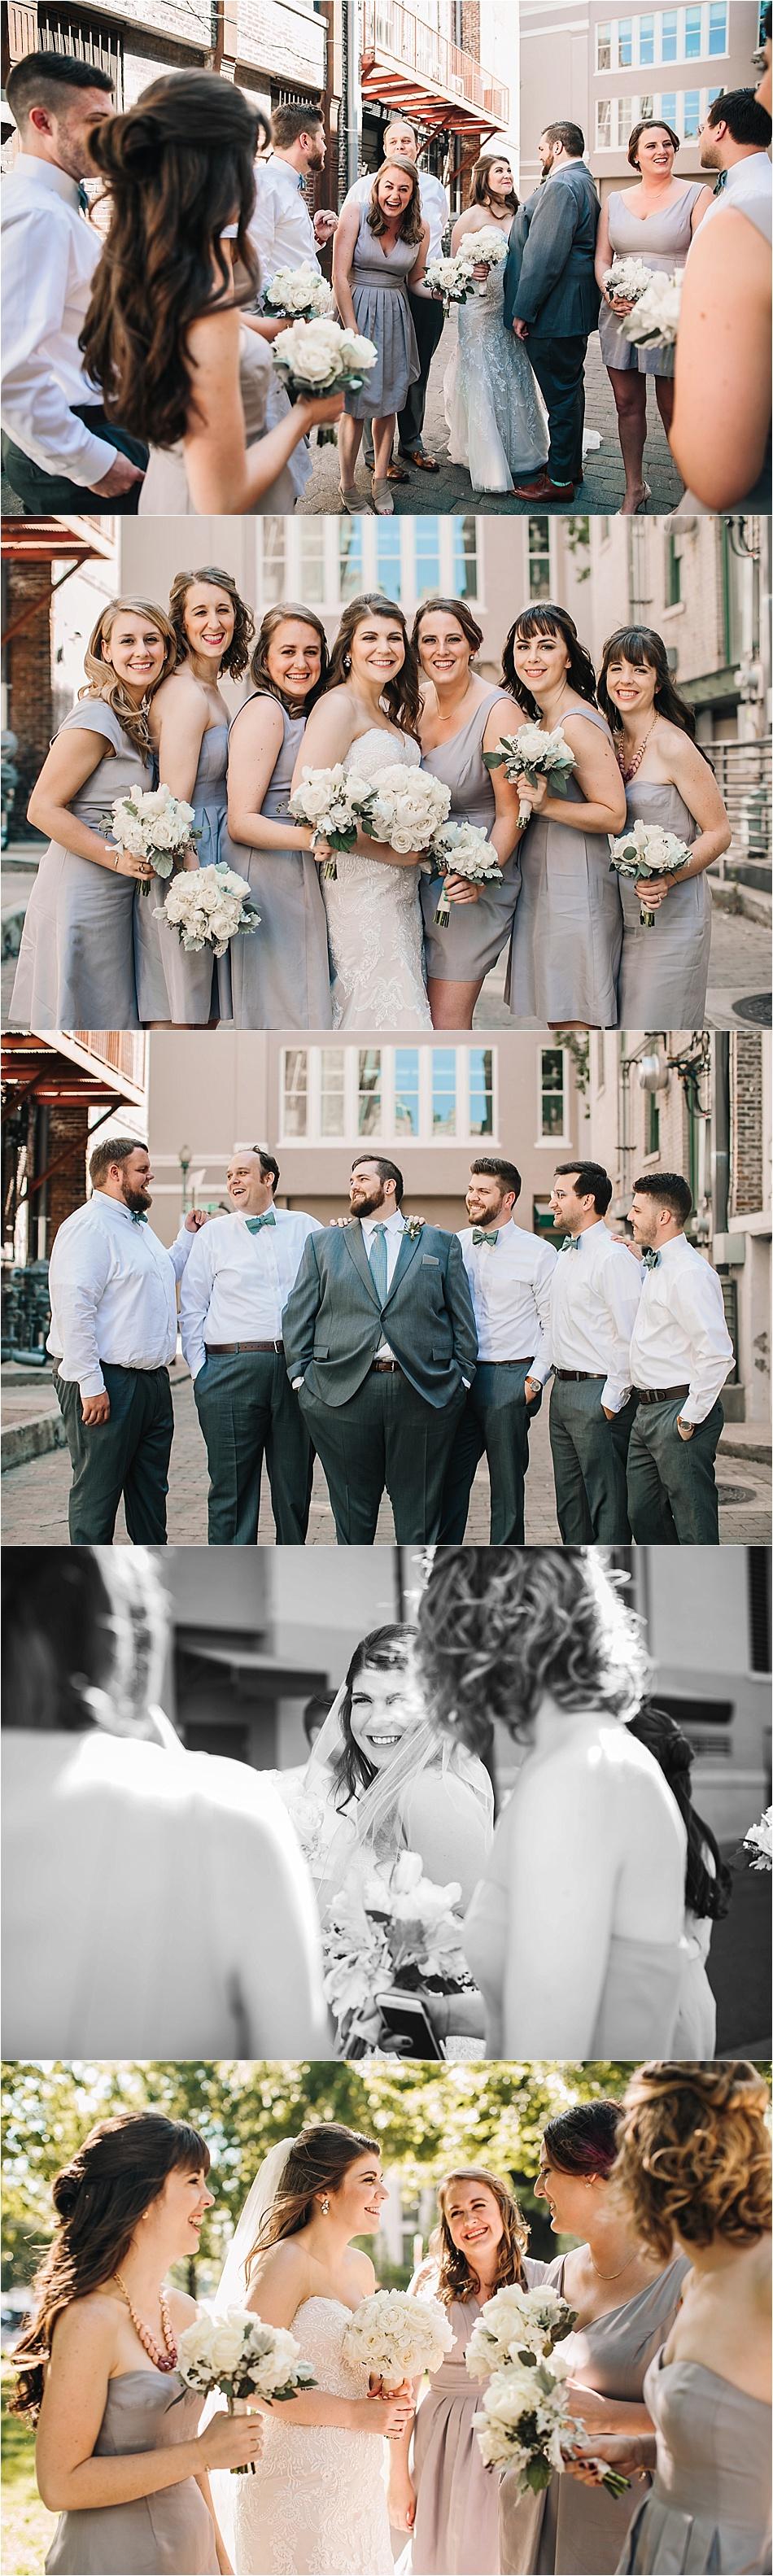 CK-Photo-Nashville-Wedding-Photographer-_0011.jpg